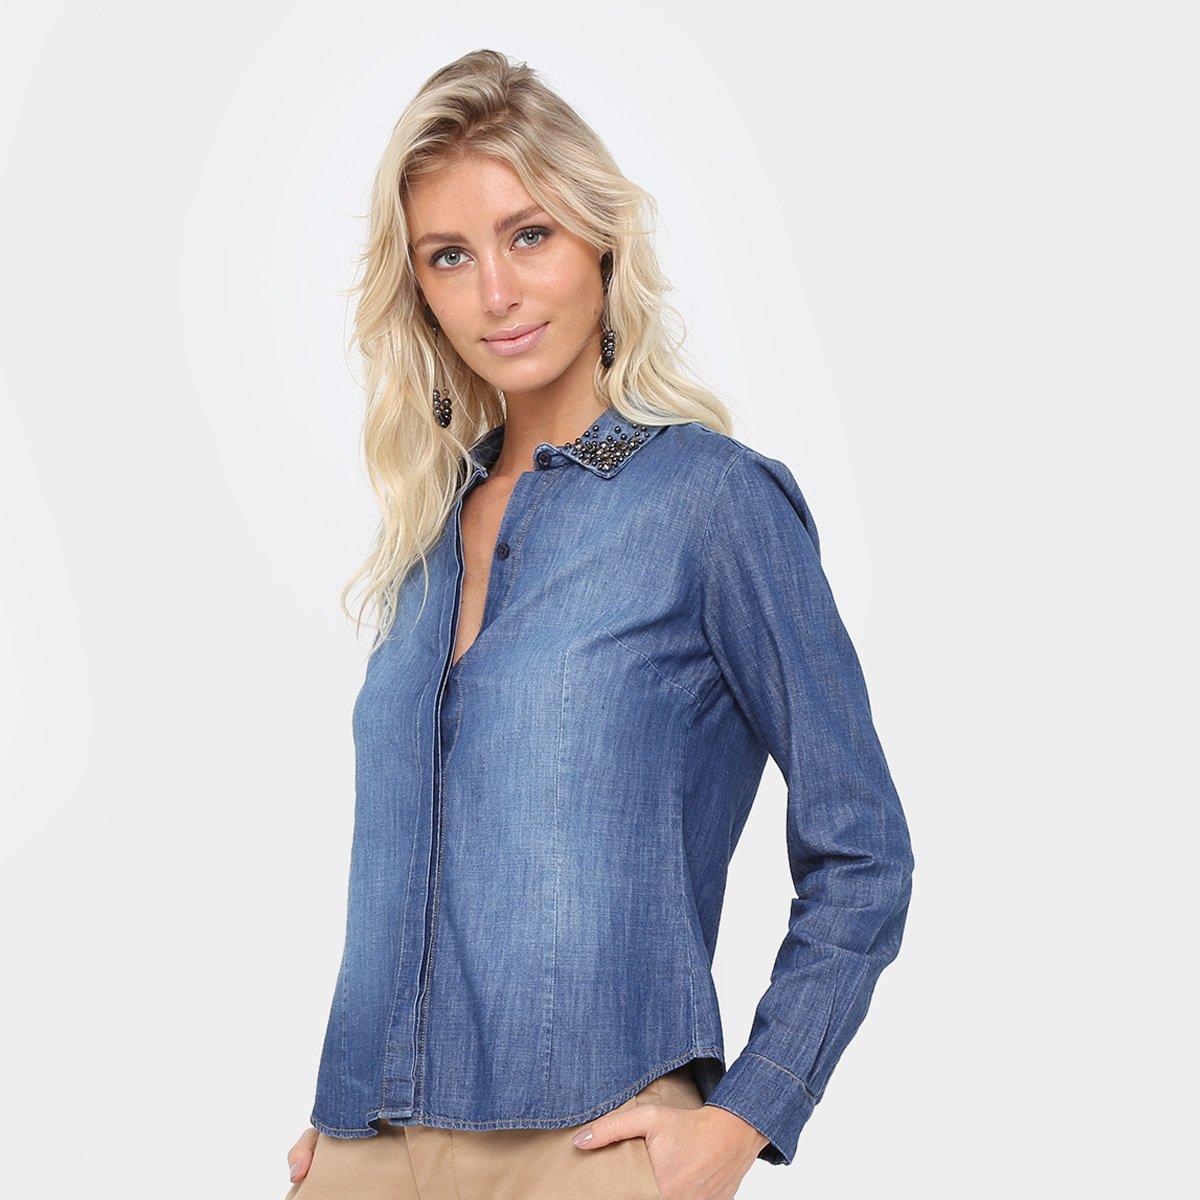 Camisa Jeans Forum Manga Longa Feminina - Compre Agora  9a709dbef6d31